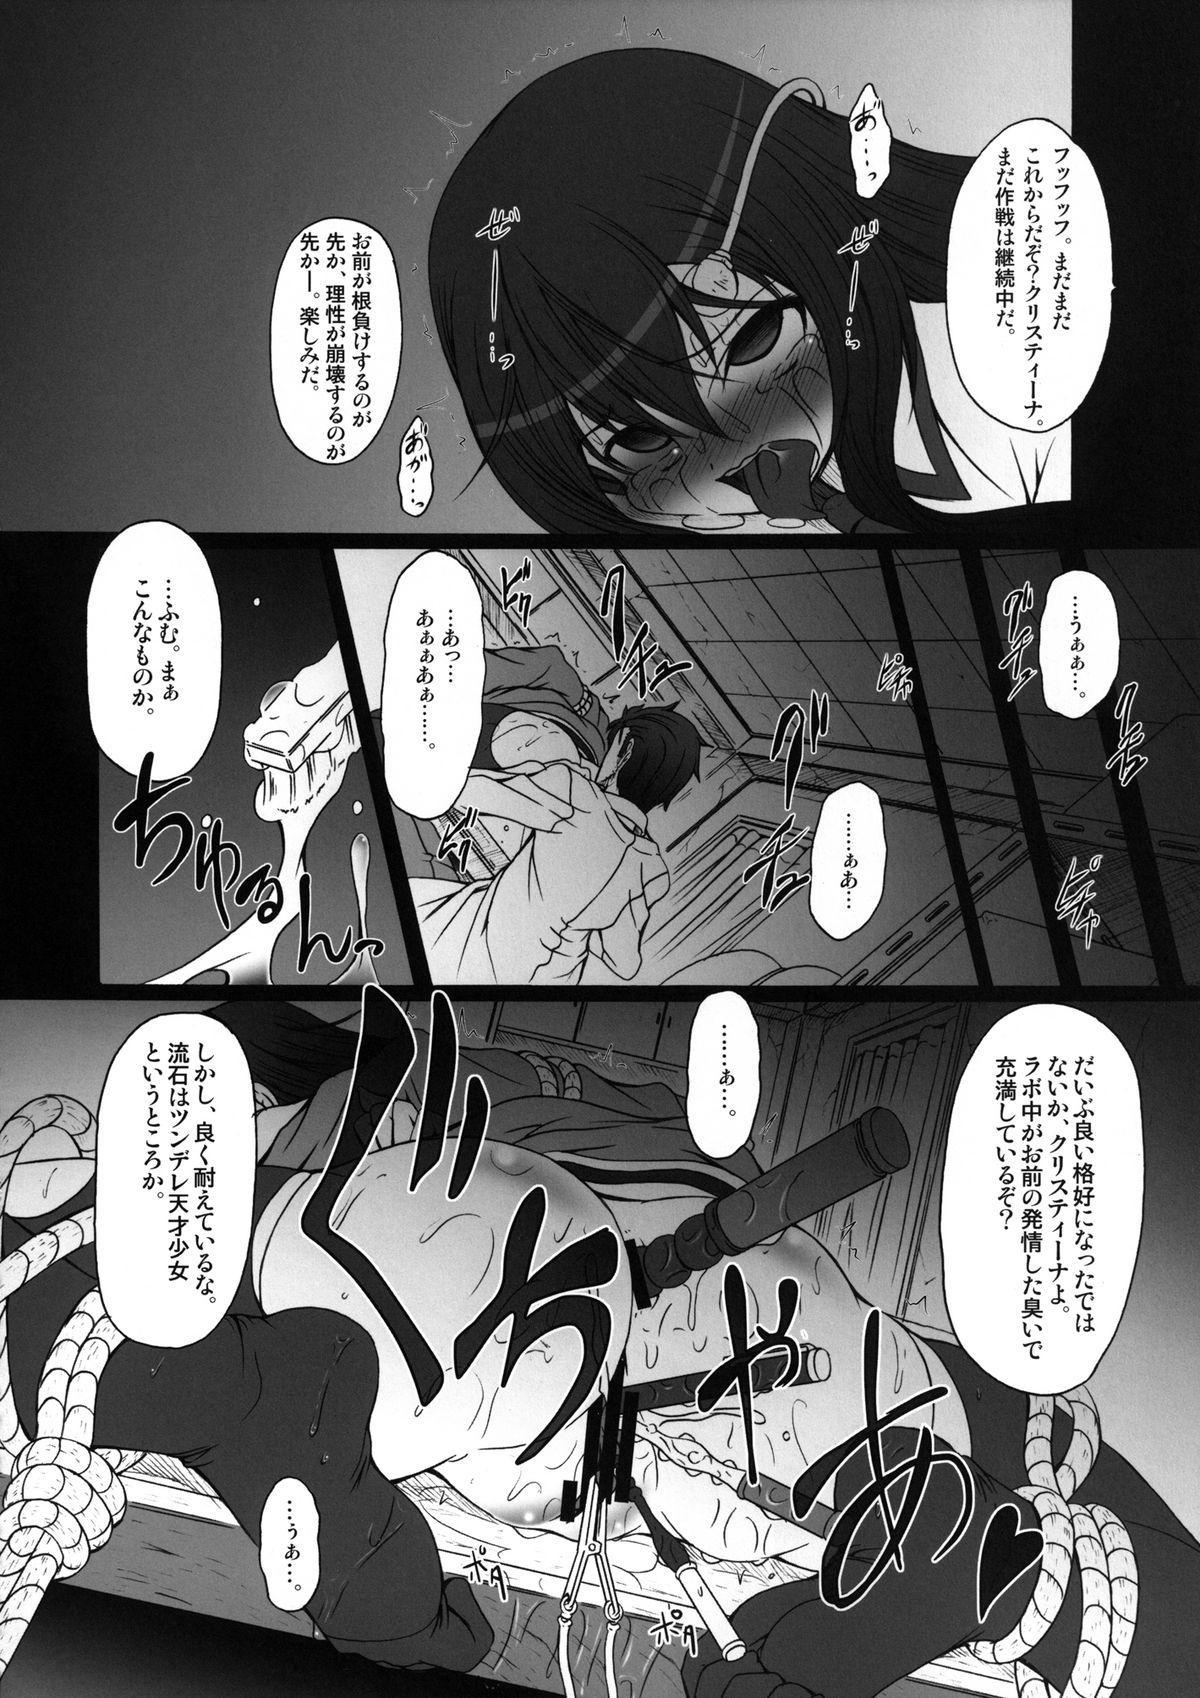 HOBBY'S BLOCK!! 14 Kairaku Tousaku no Ecstasy 19